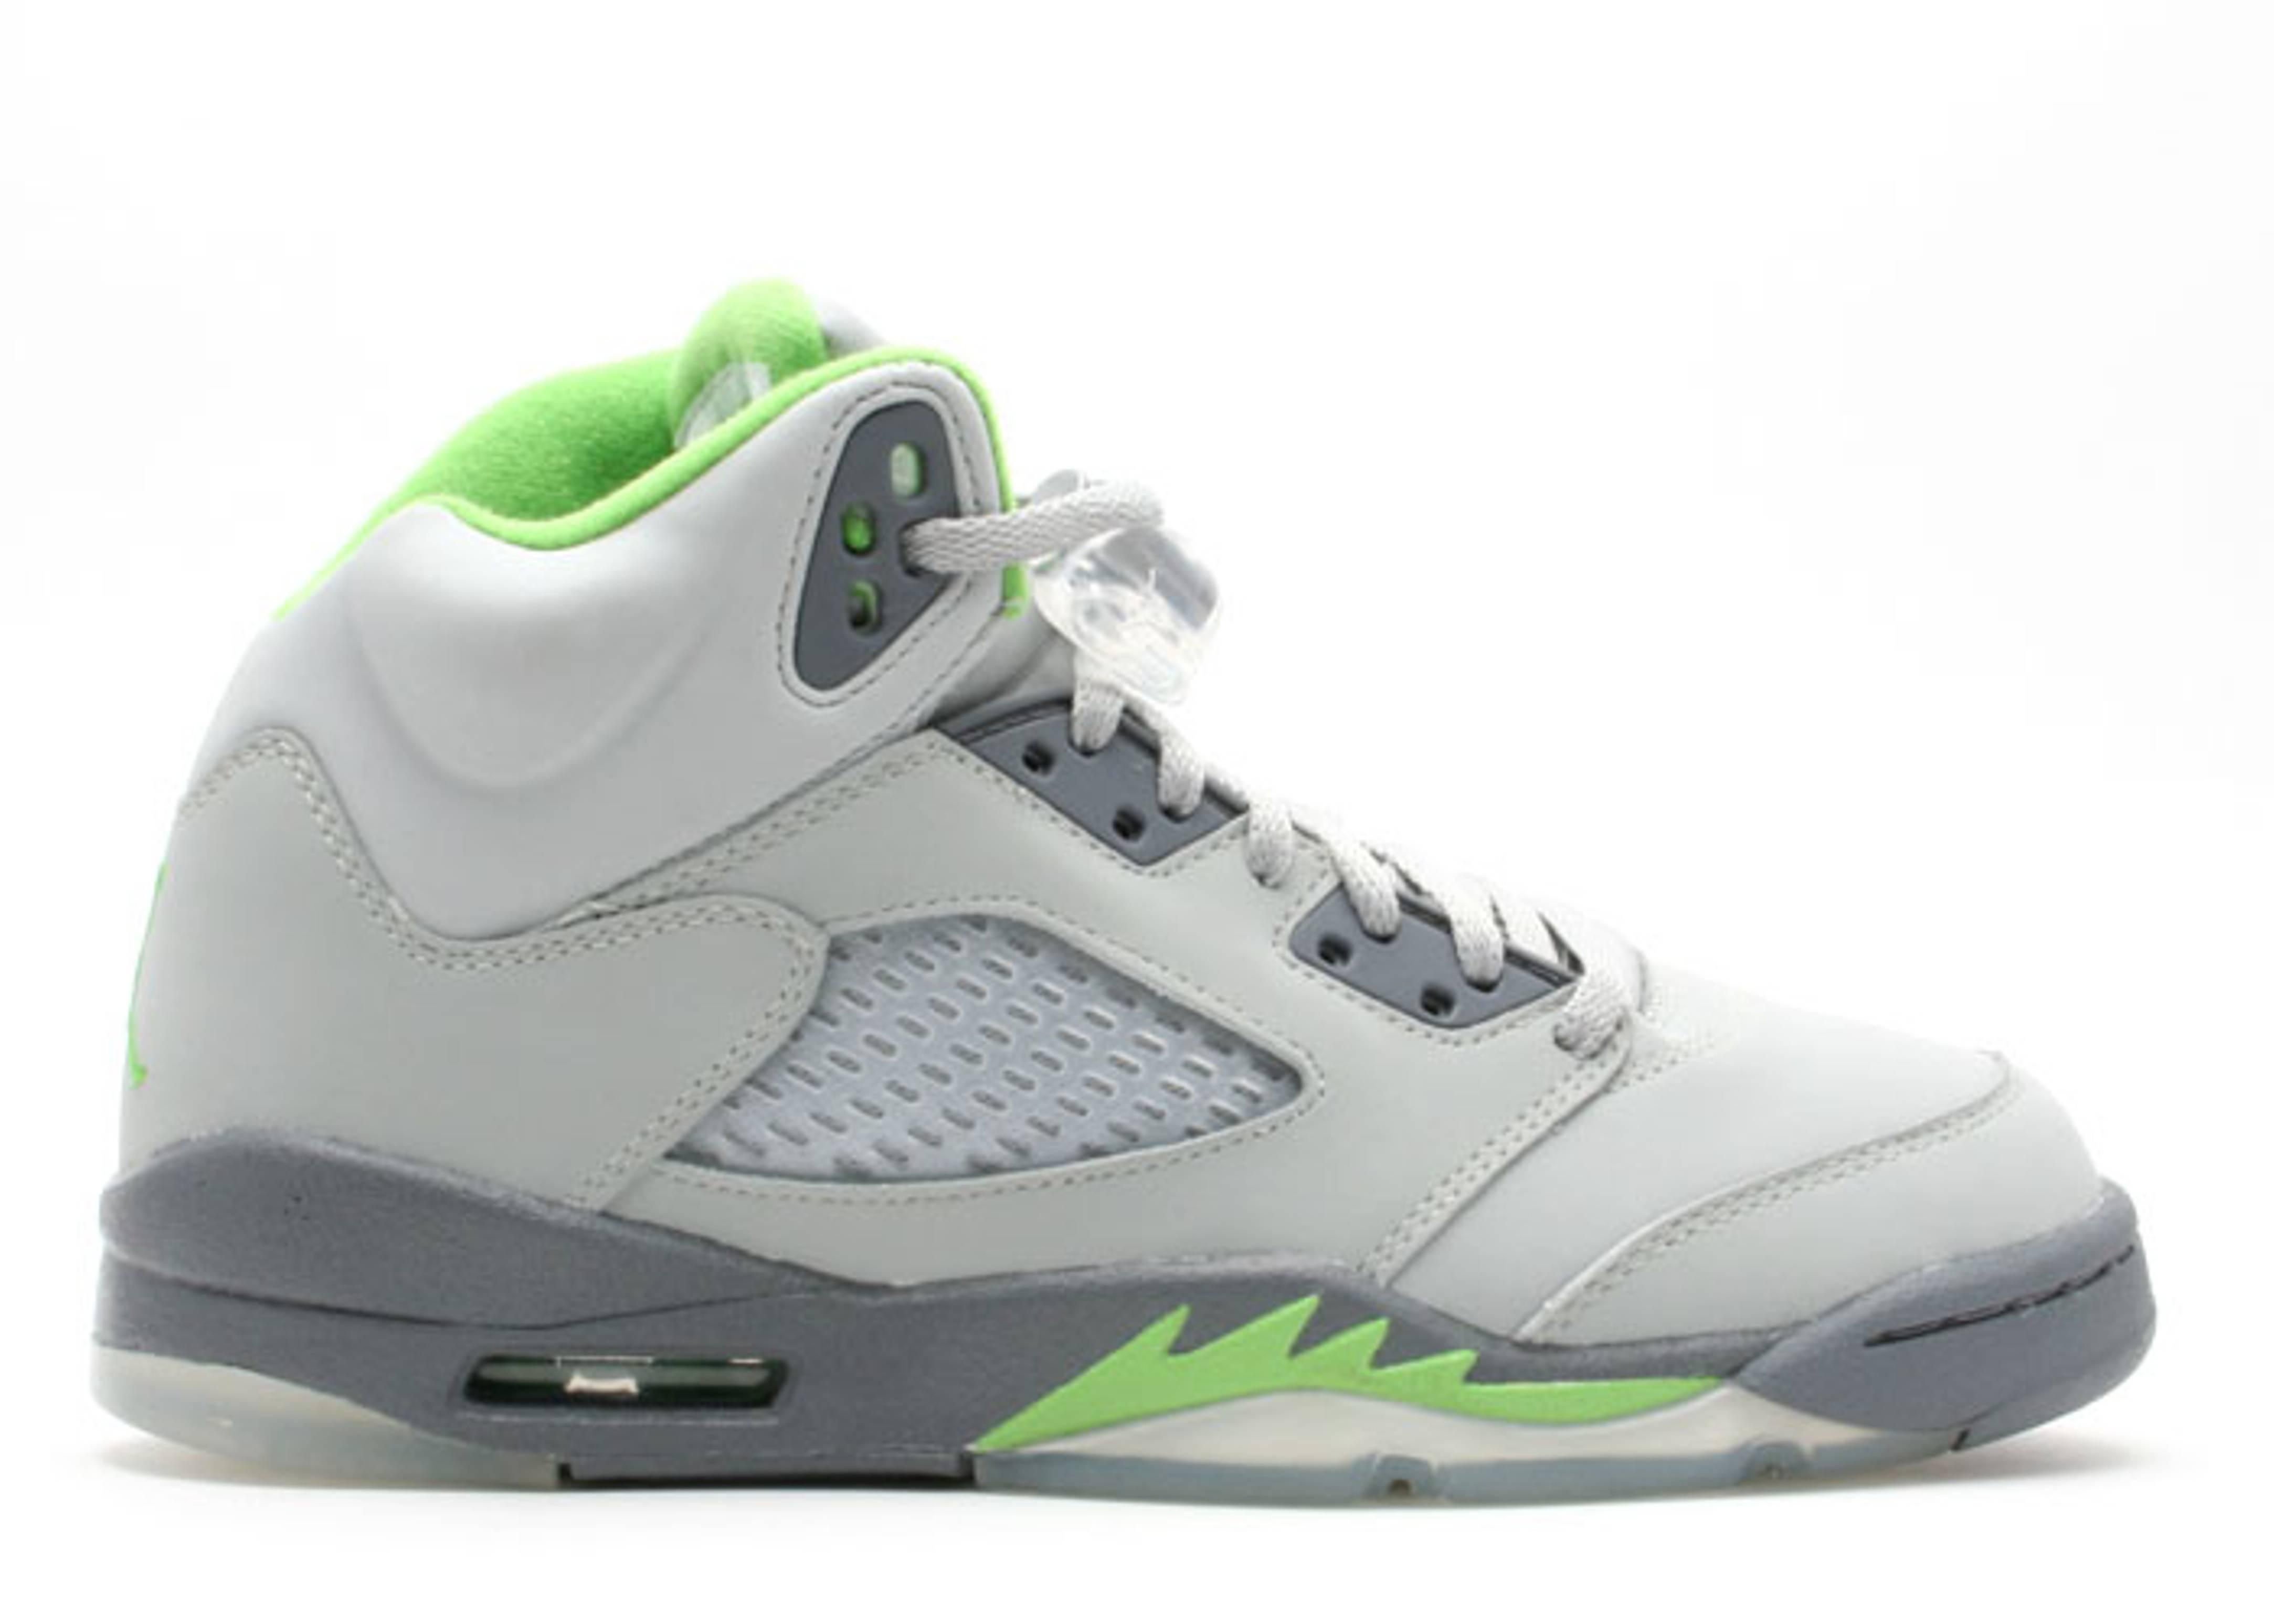 3d99b7c509e ... Bel Air Gray Purple Green Shoes; Air Jordan 5 Retro (gs) ...